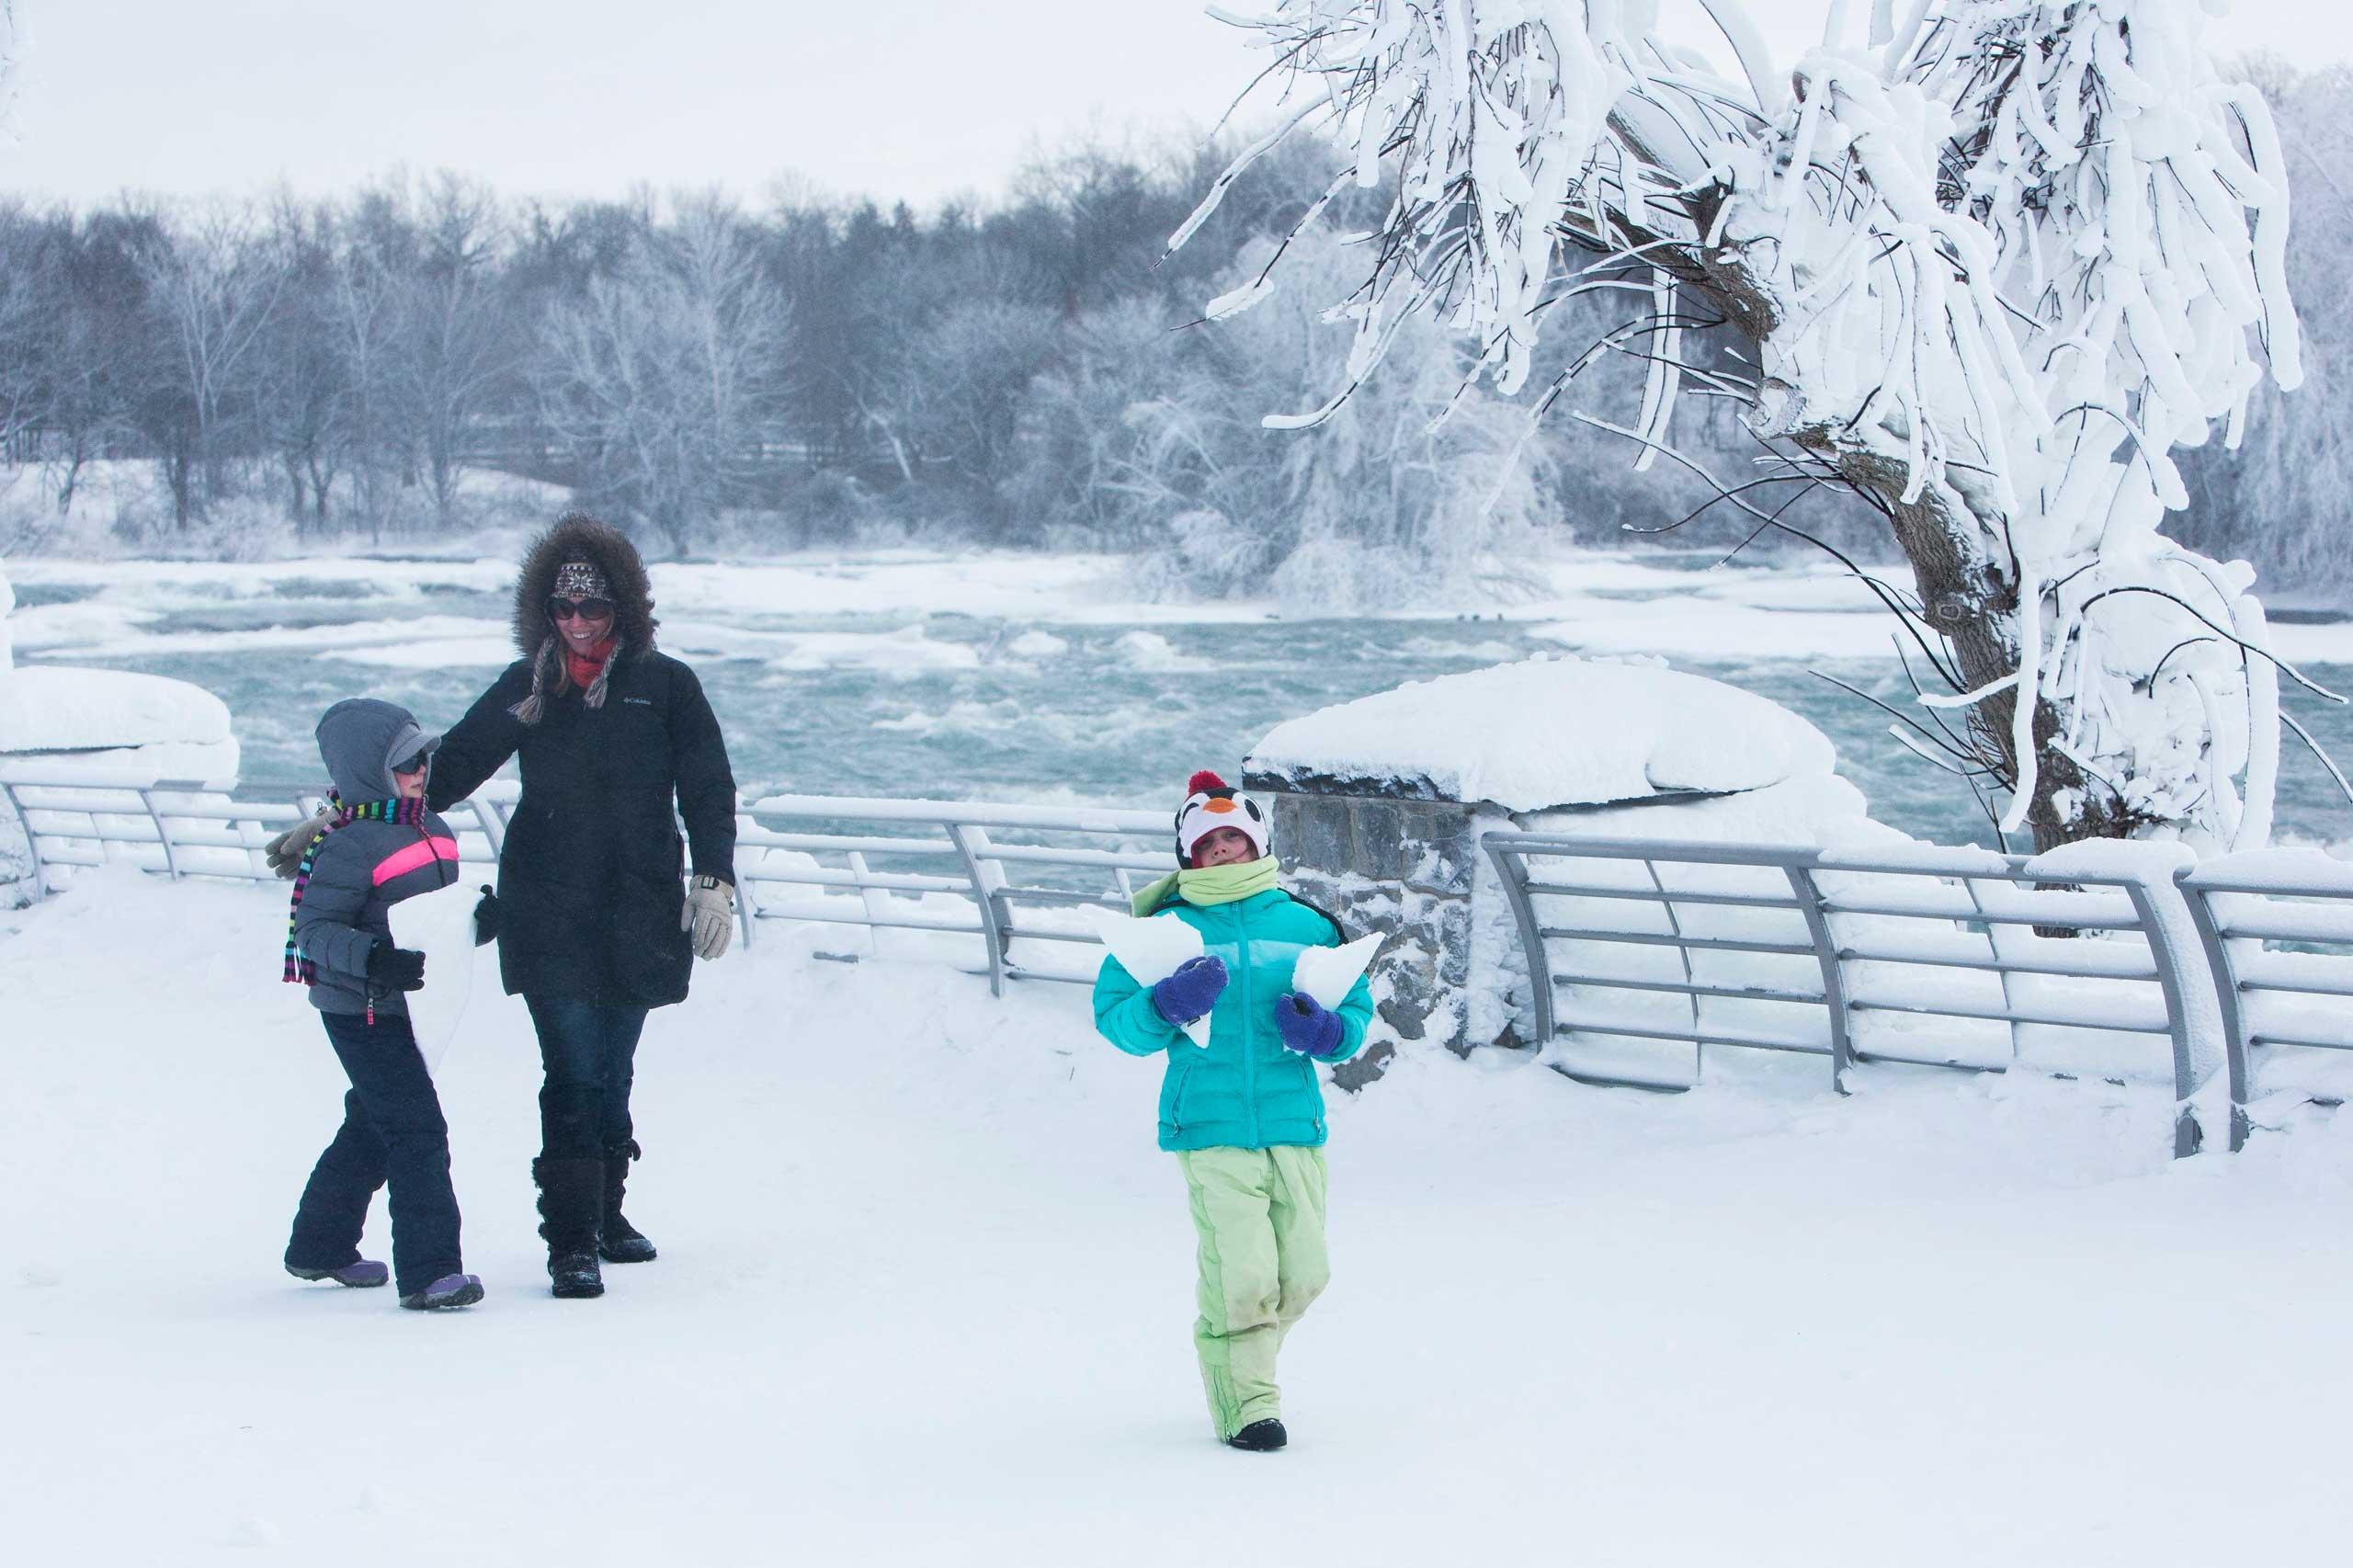 A family walks through the snow near the frozen Niagara Falls in Niagara Falls, N.Y.,Feb. 17, 2015.